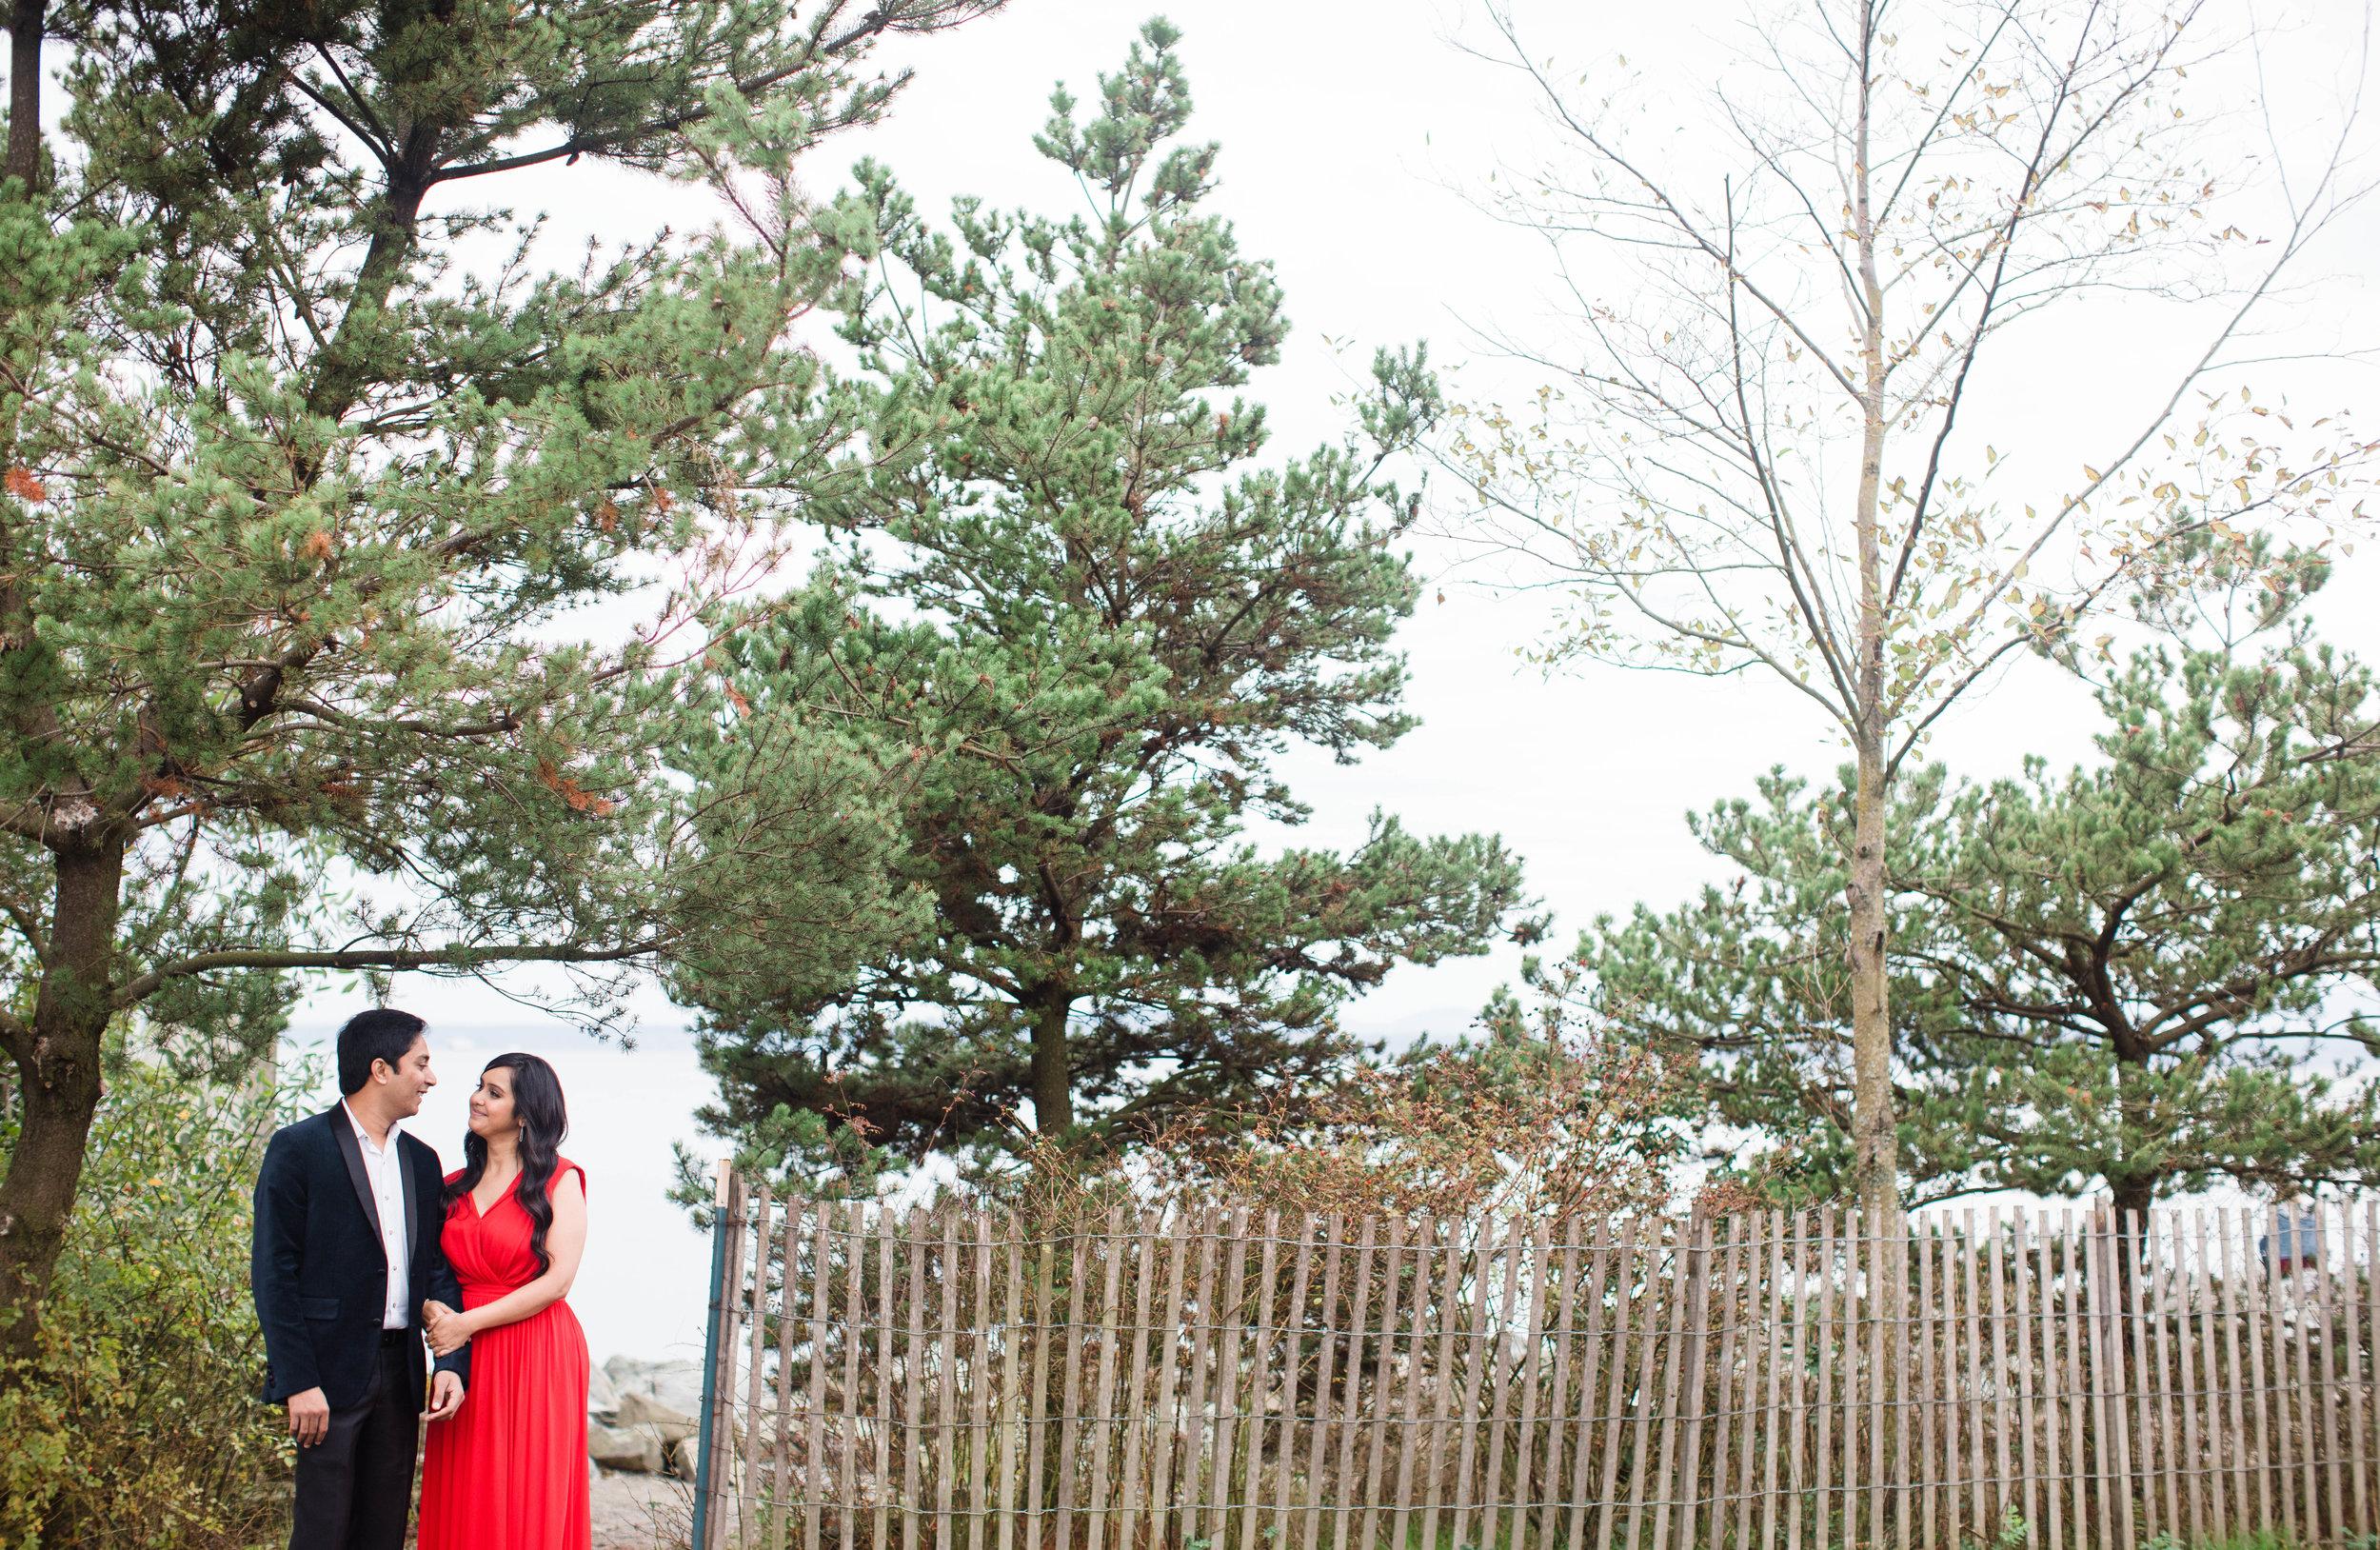 Olympic Sculpture parkEngagement photos by adina preston weddings. Affordable Seattle wedding Photographer